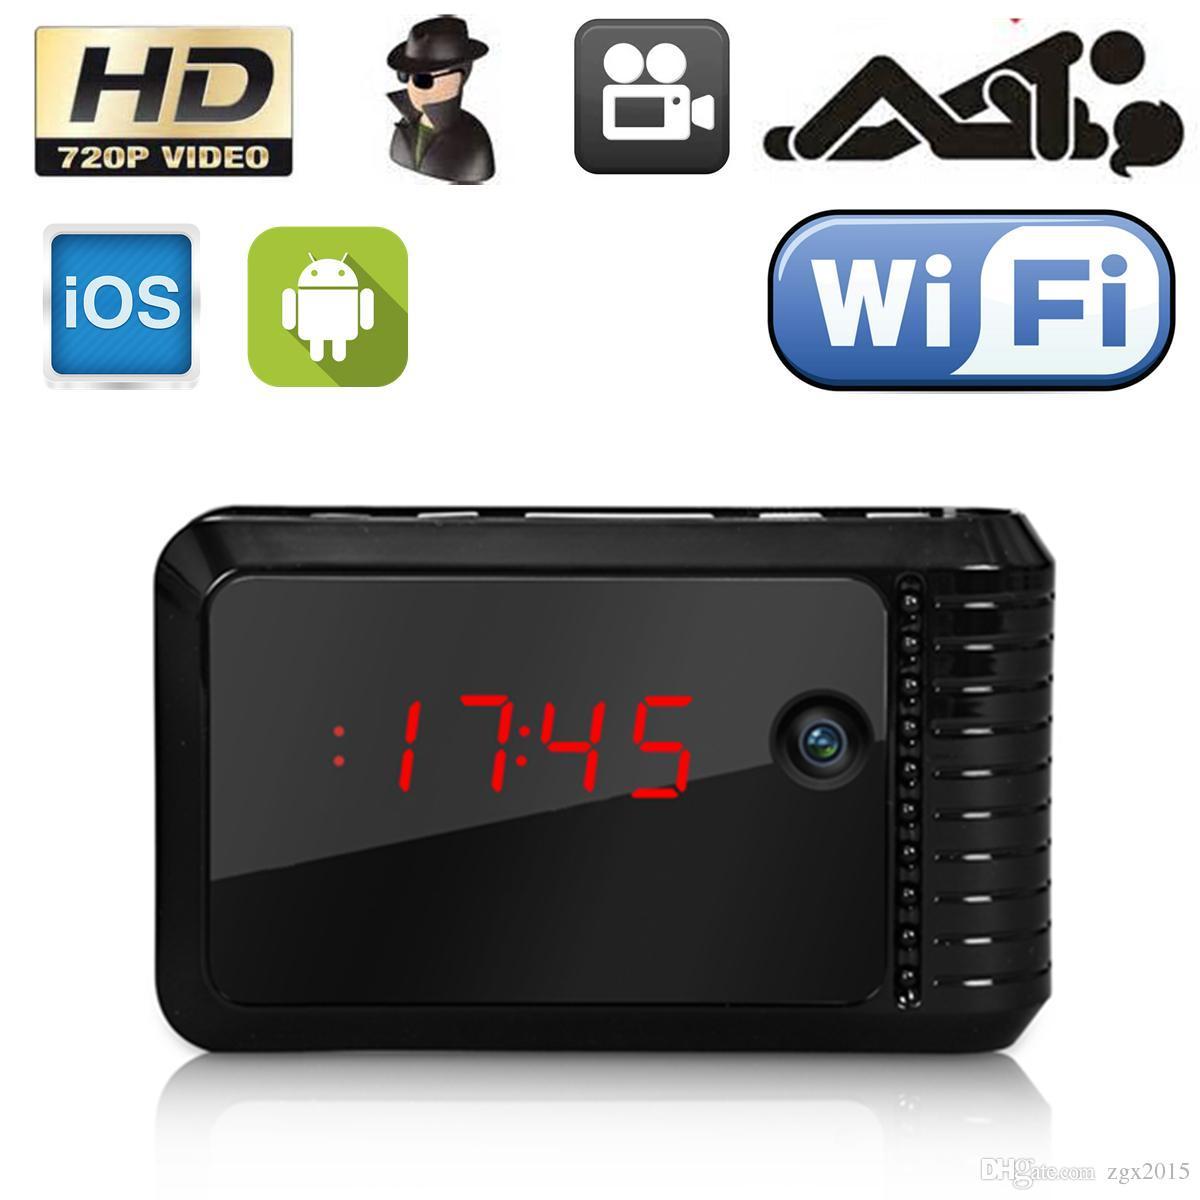 Camera Android Phone Spy Camera wireless wifi ip hd spy camera night vision clock dv dvr hidden cam video record h